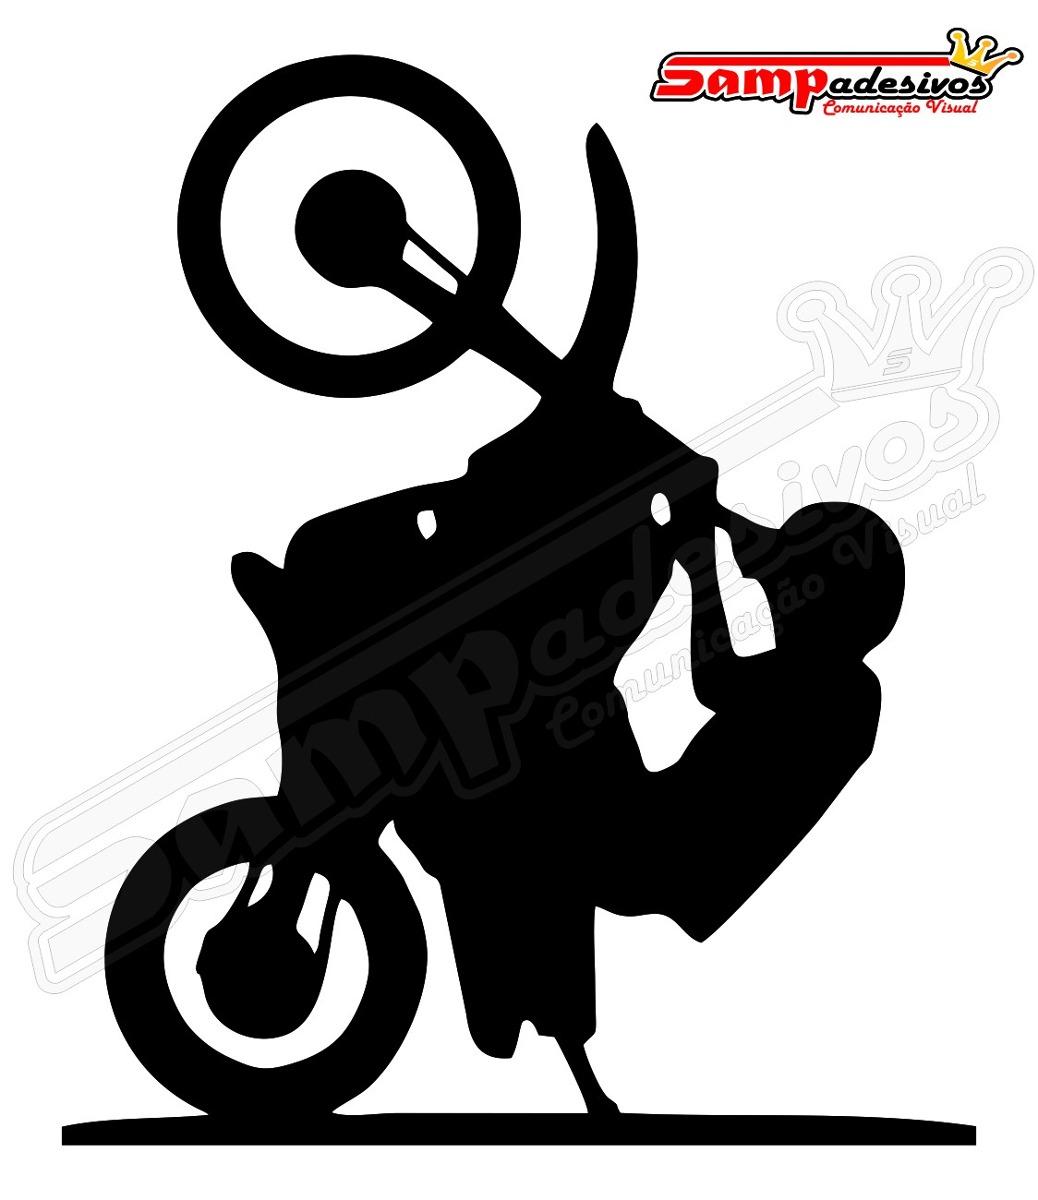 Adesivo Wheling, Grau, Empinar Moto, Tuning R$ 6,90 em Mercado Livre